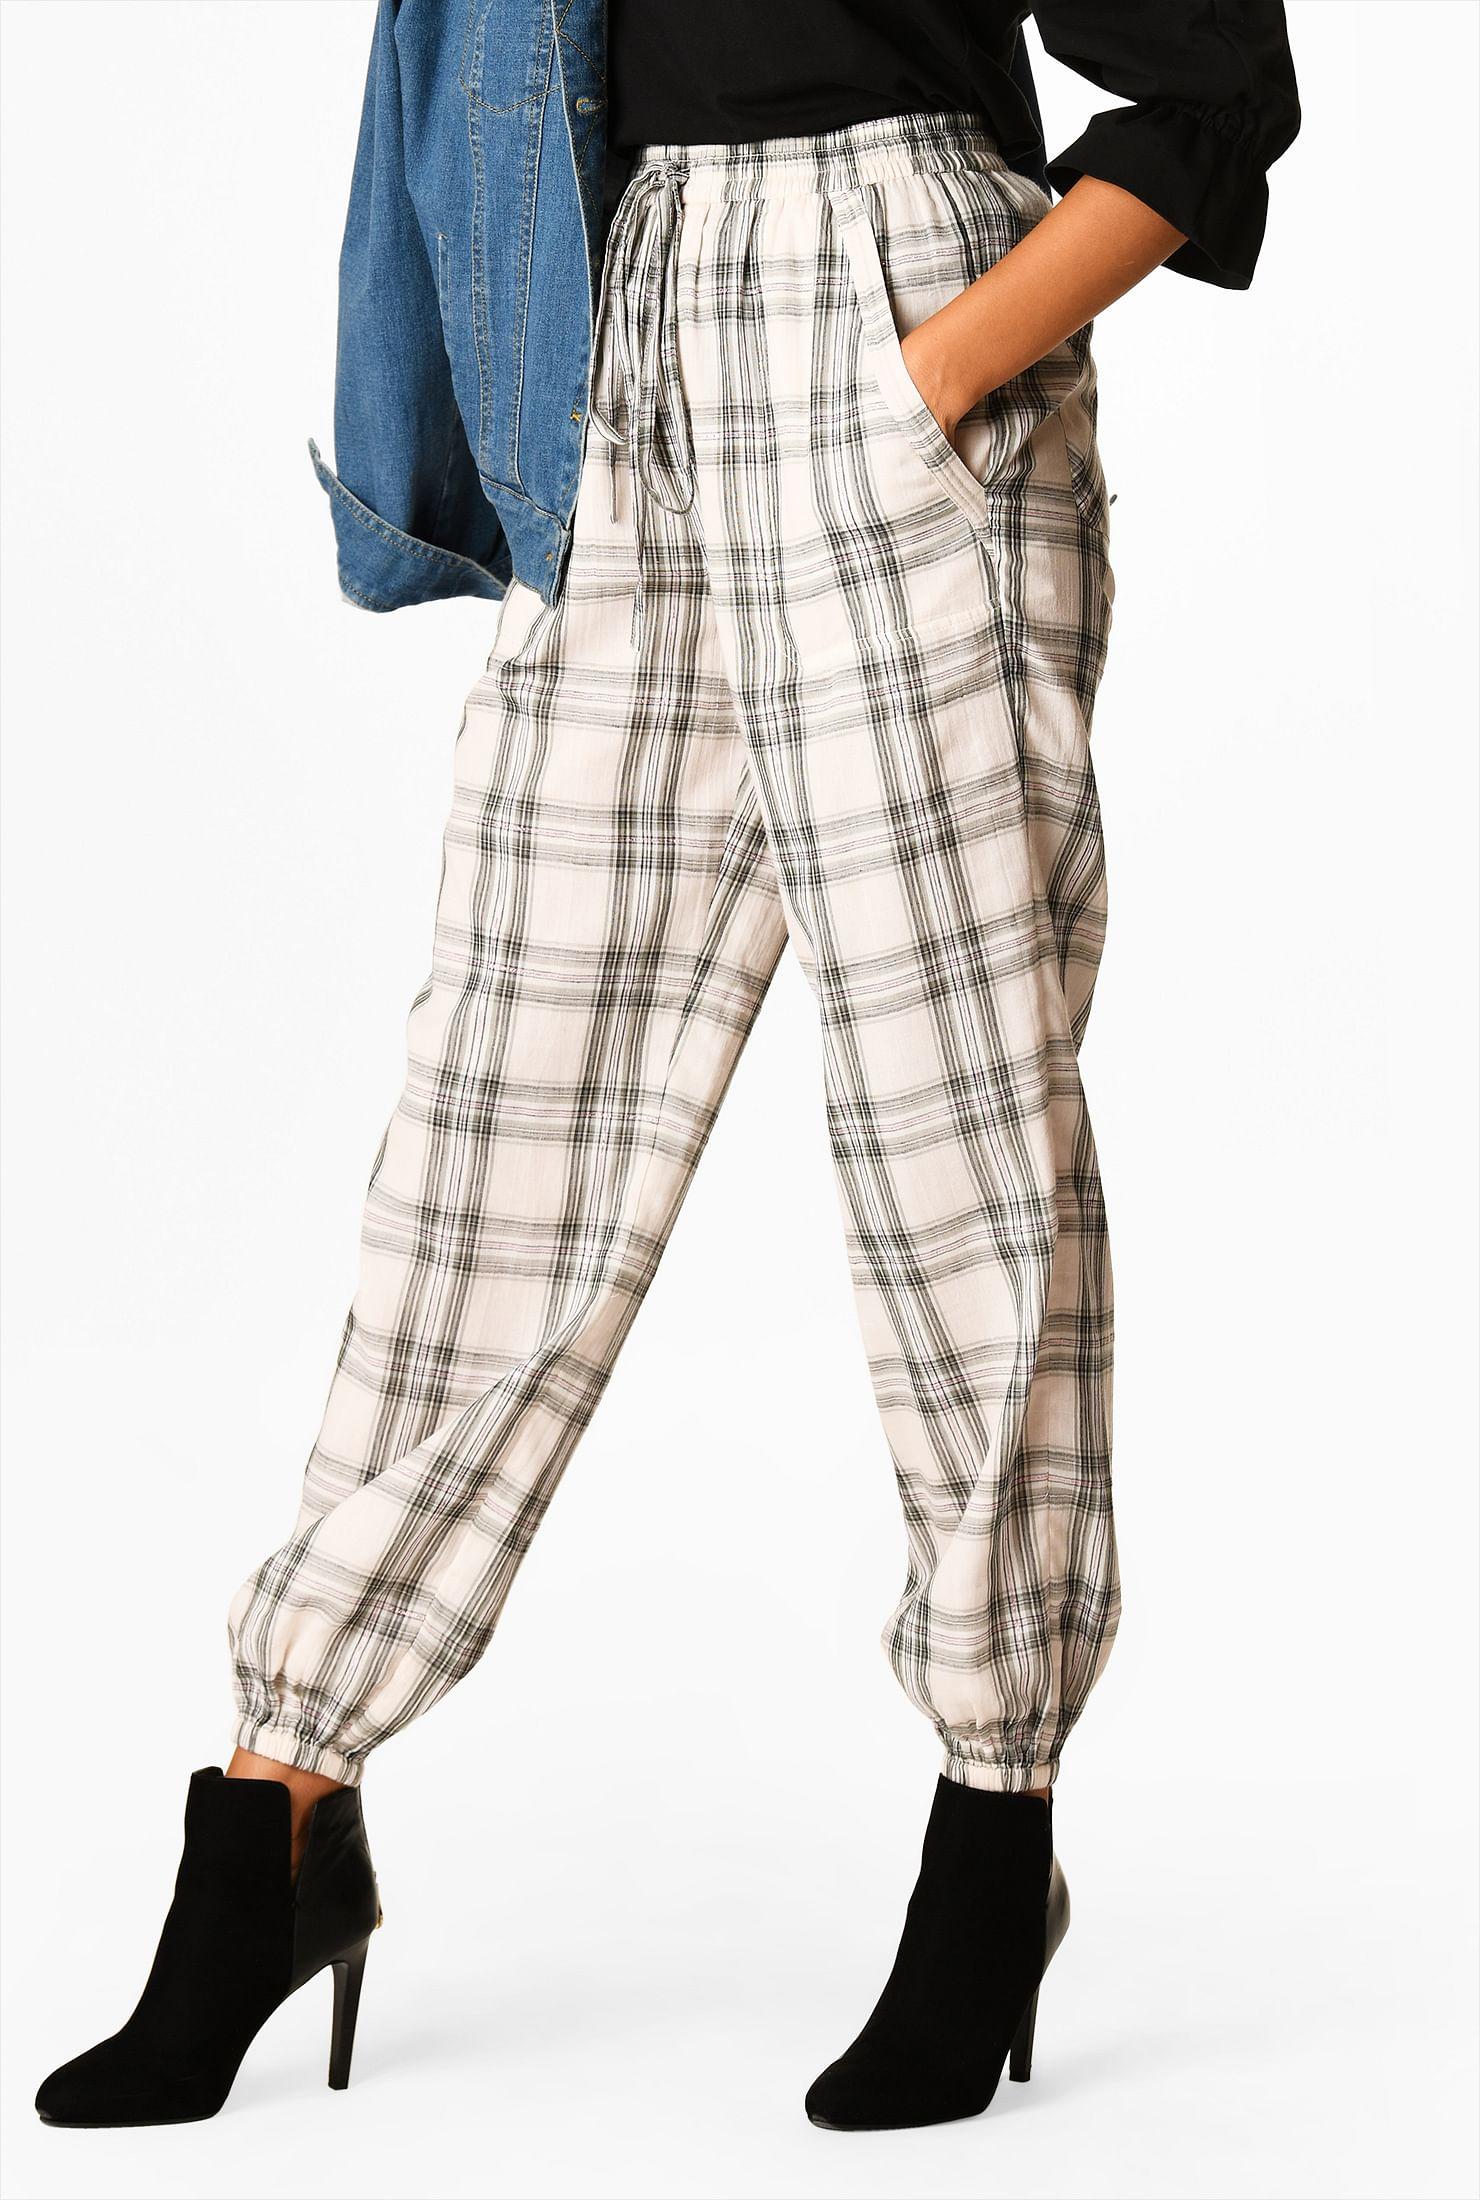 RYUIS Cuccos Hyrule Drawstring Waist,100/% Cotton,Elastic Waist Cuffed,Jogger Sweatpants